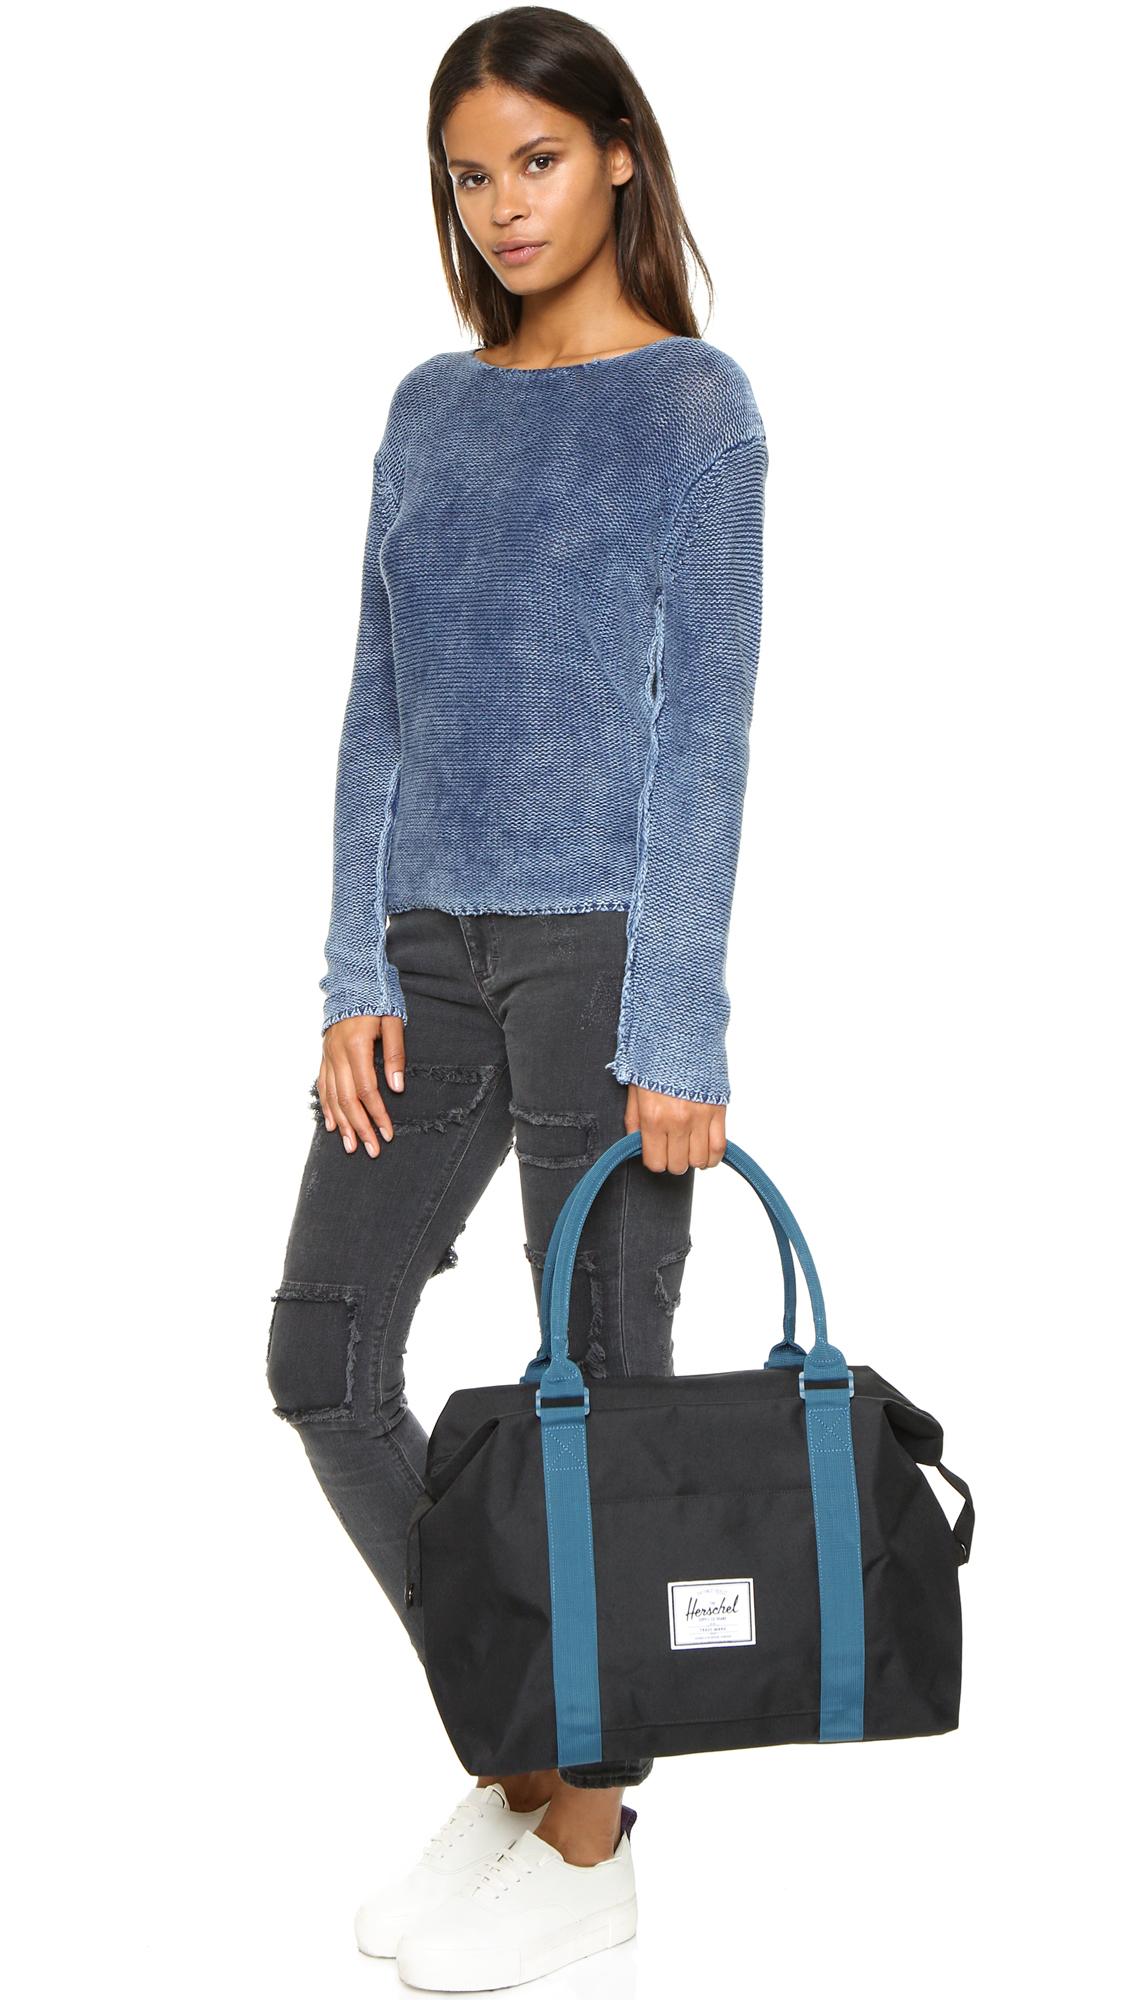 fa297bb2cb Lyst - Herschel Supply Co. Strand Duffel Bag - Black ink Blue in Black